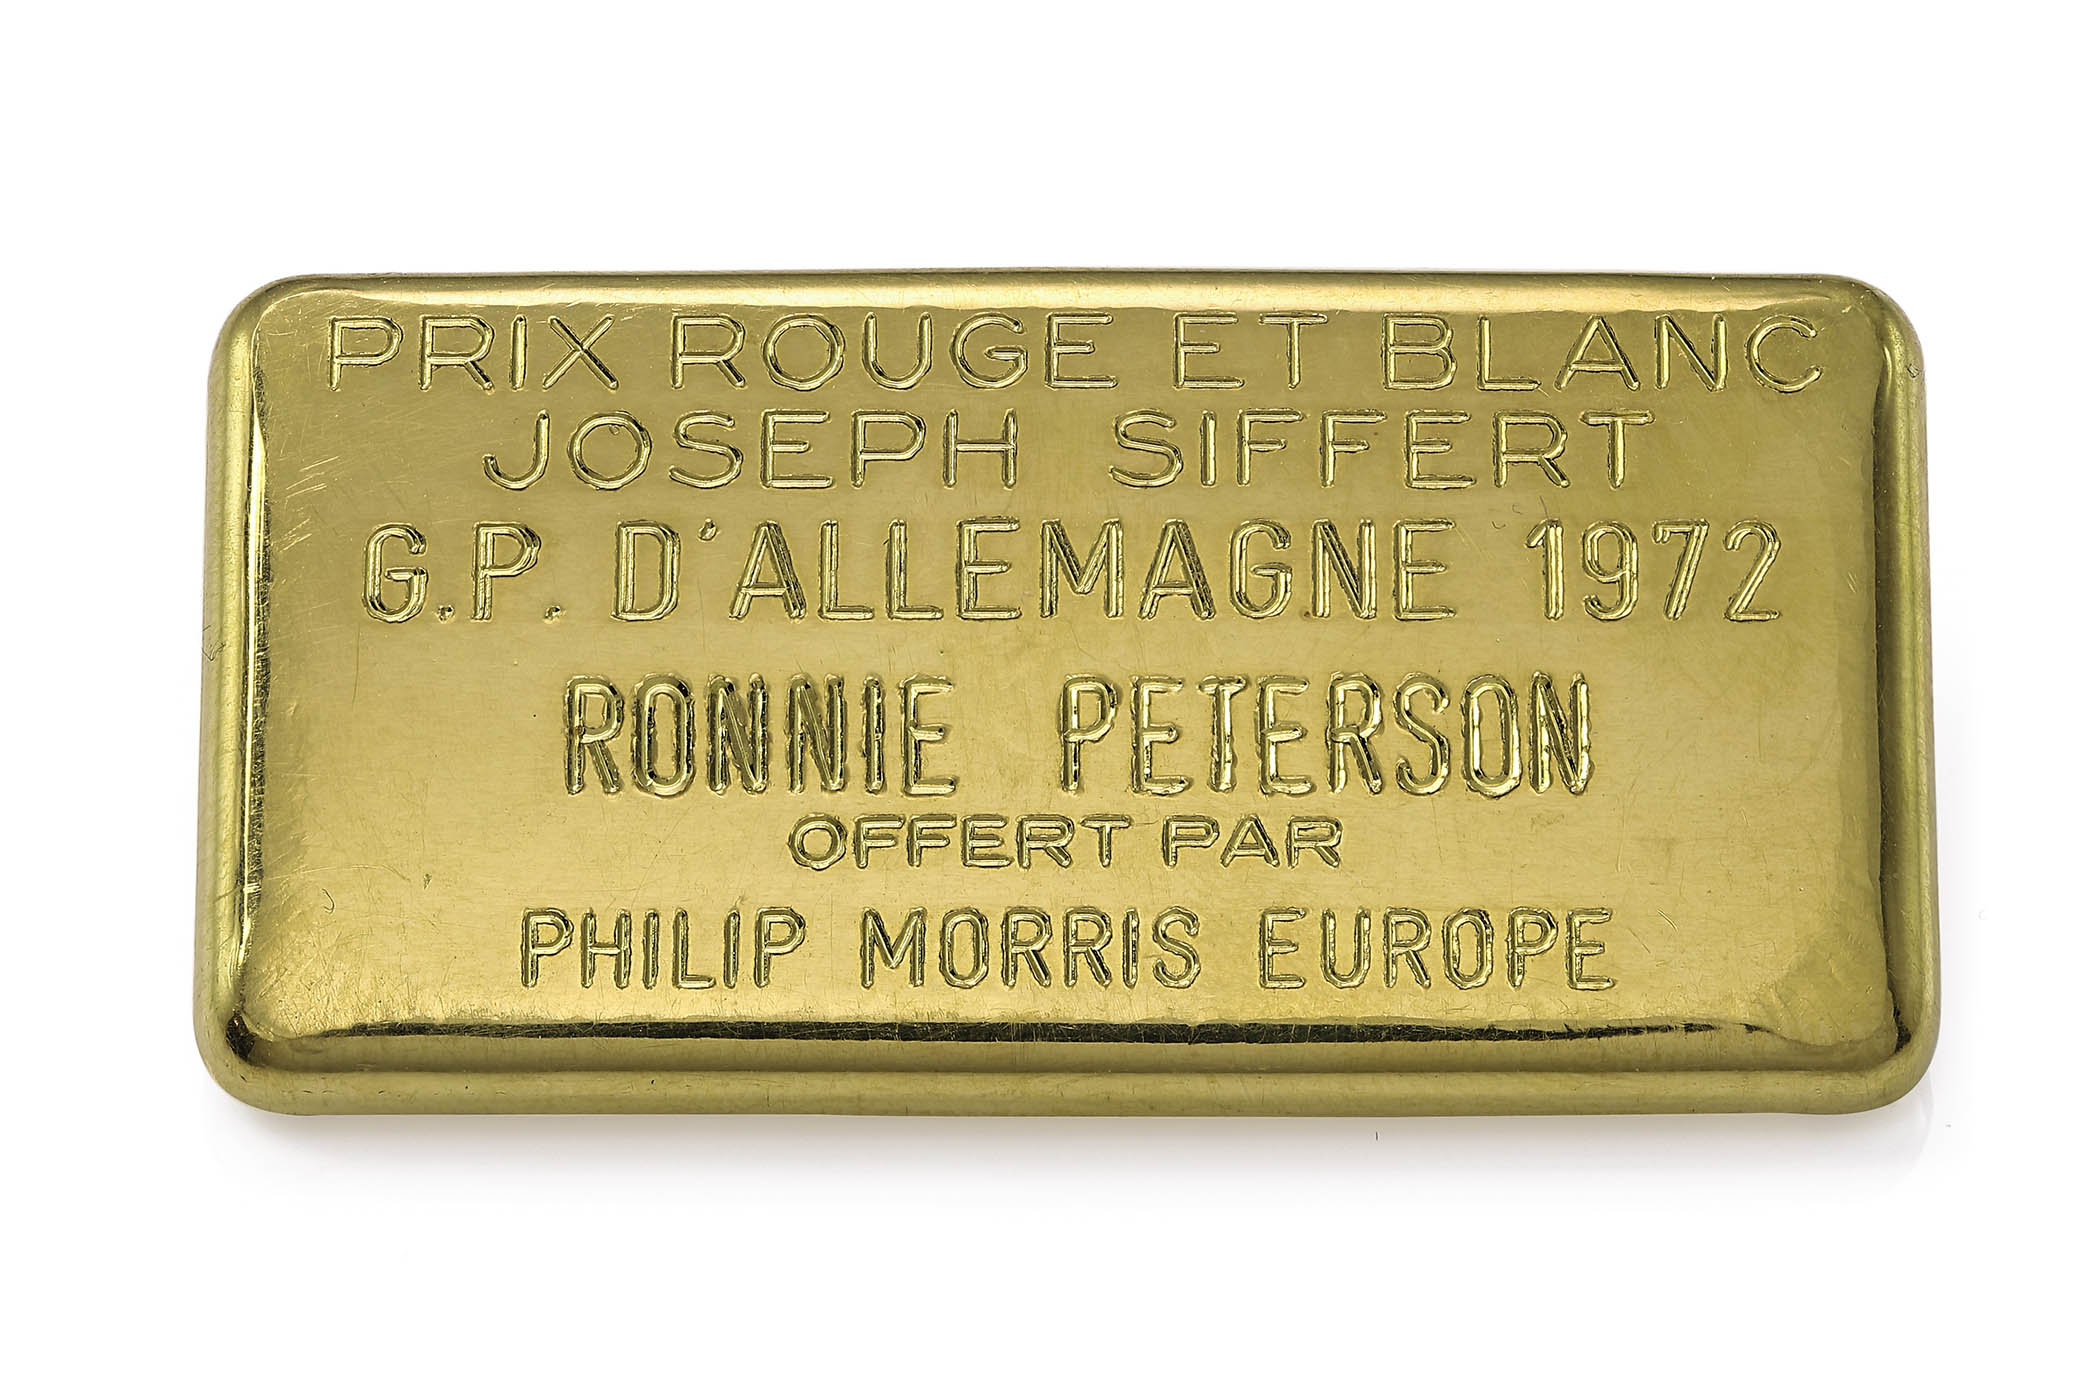 Ronnie Peterson Jo Siffert Prix Rouge et Blanc Award